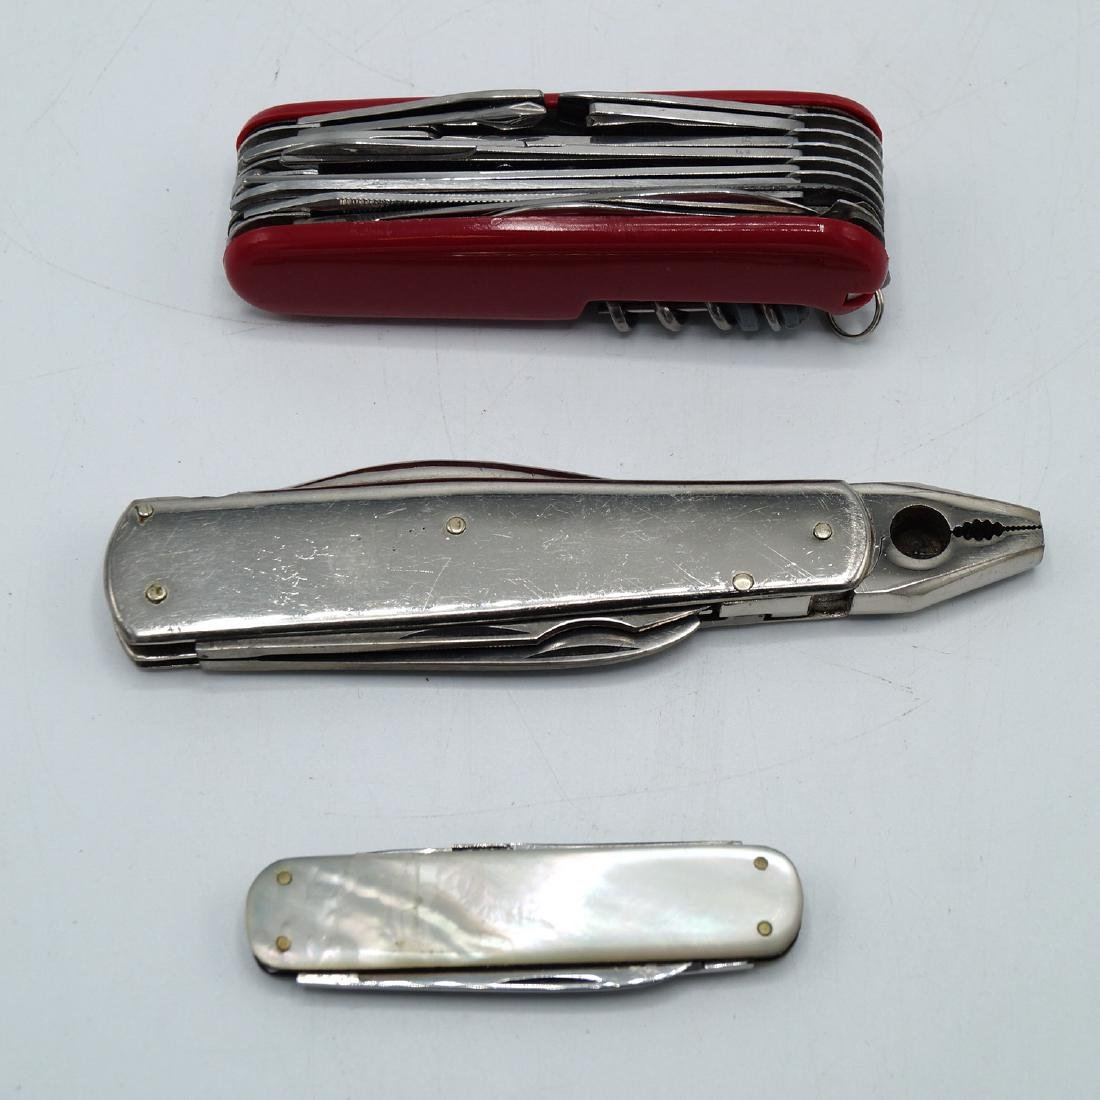 3 PEN KNIVES